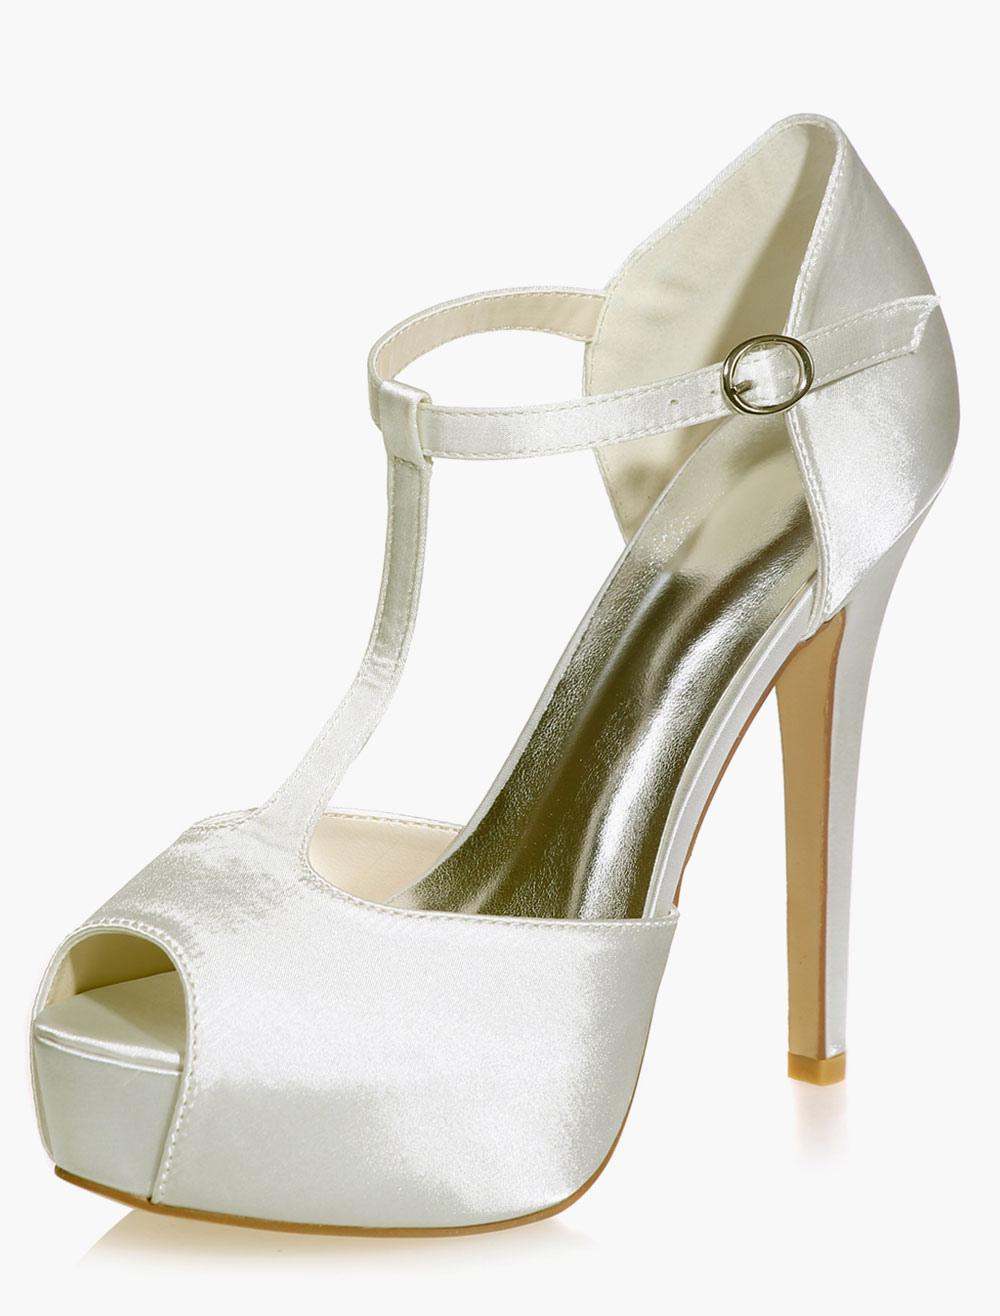 Peep Toe Satin Paltform Evening and Bridal Sandals